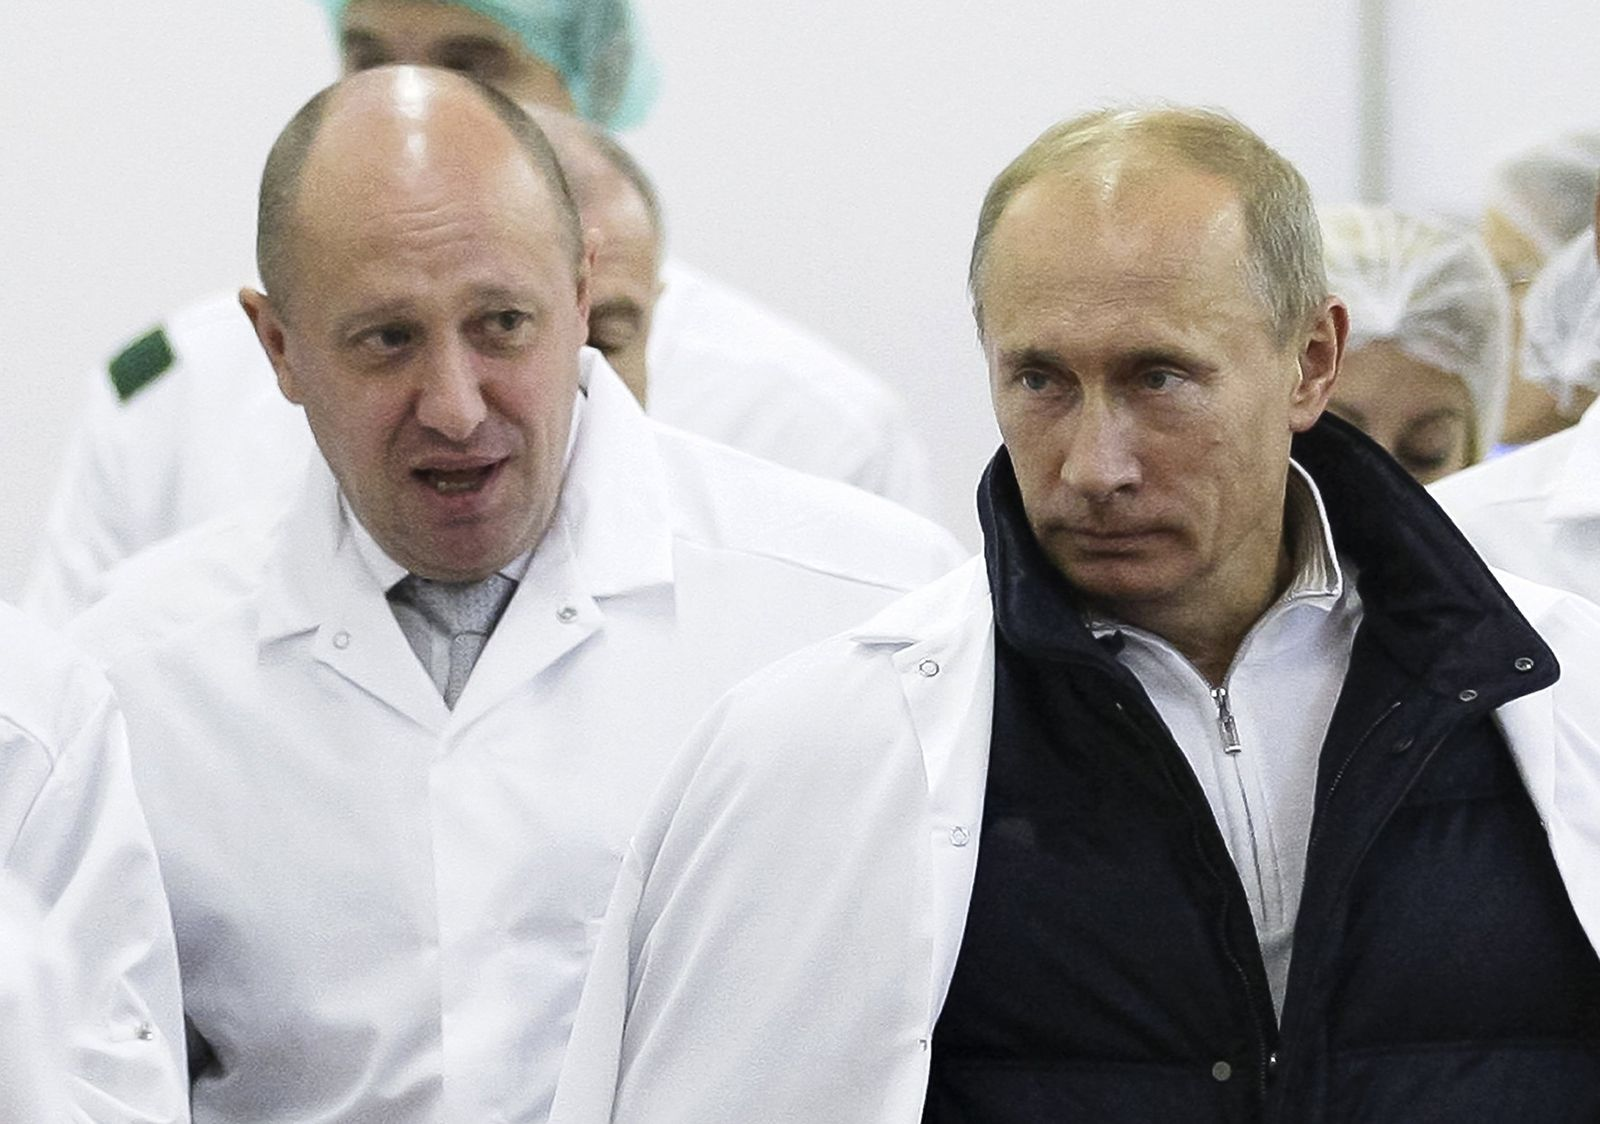 Jewgeni Prigoschin/ Yevgeny Prigozhin/ Putin/ Trump